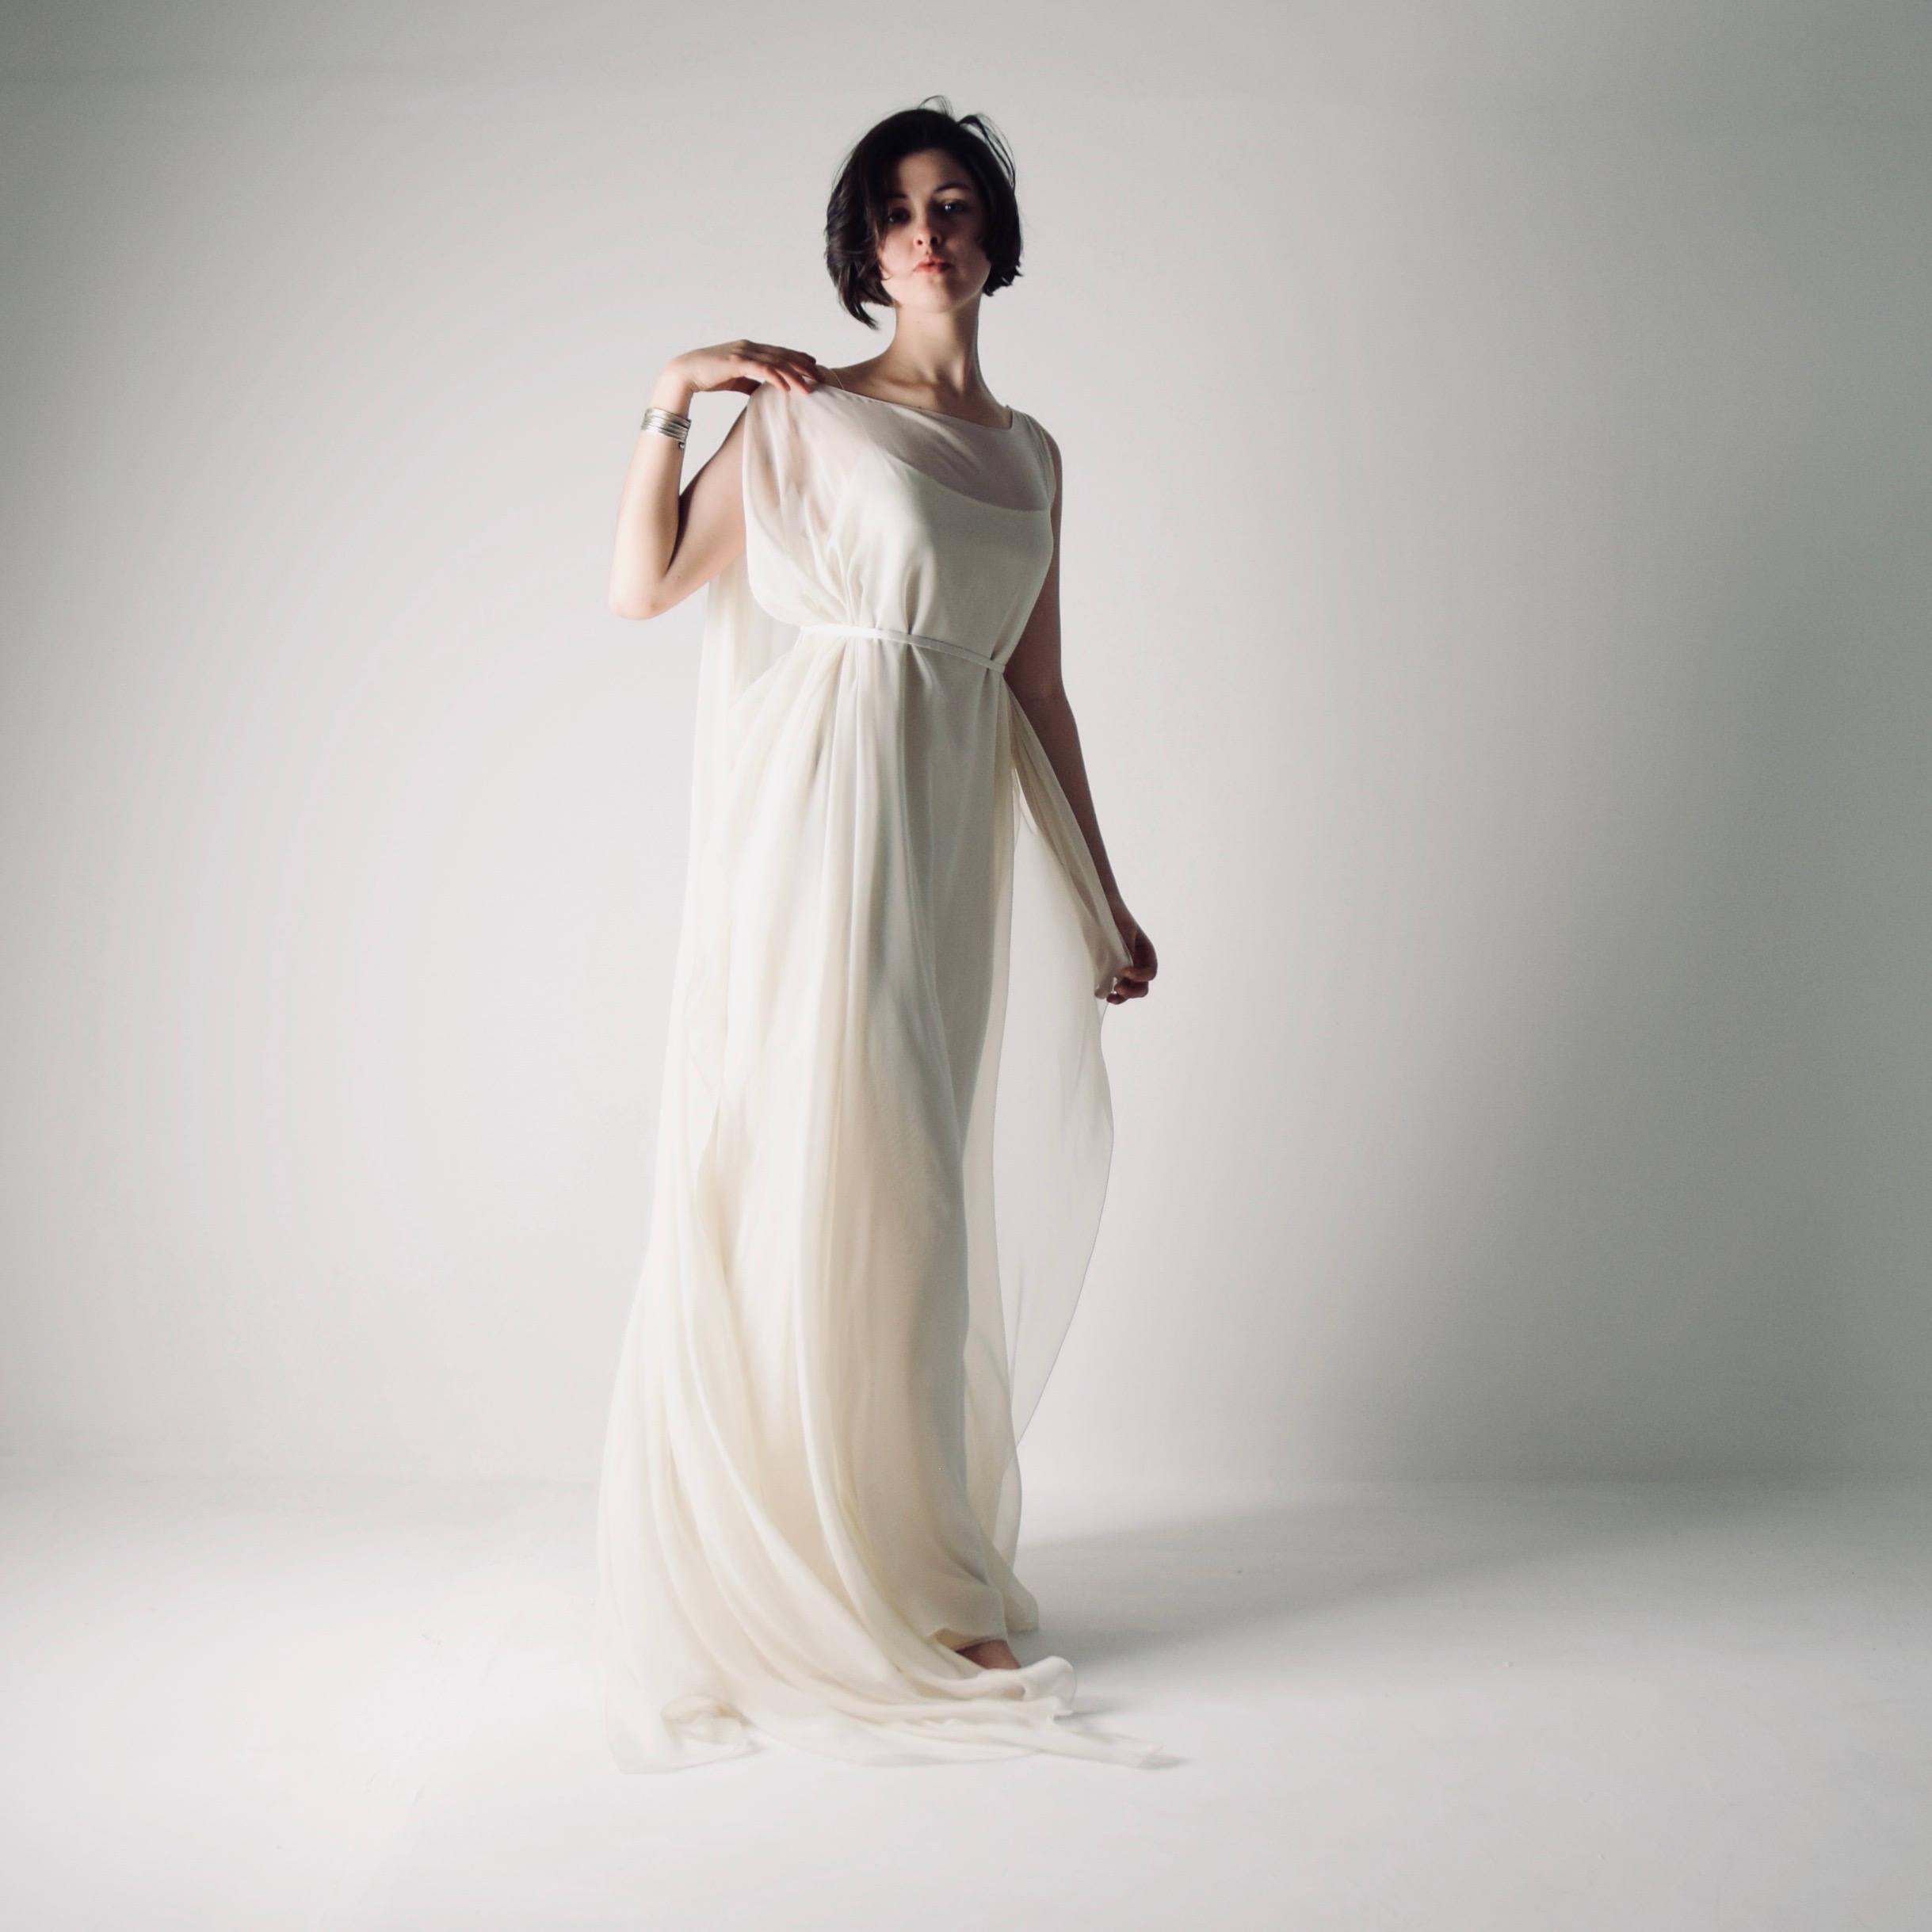 Simple Wedding Dress Hippie: Unstructured Silk Gown By